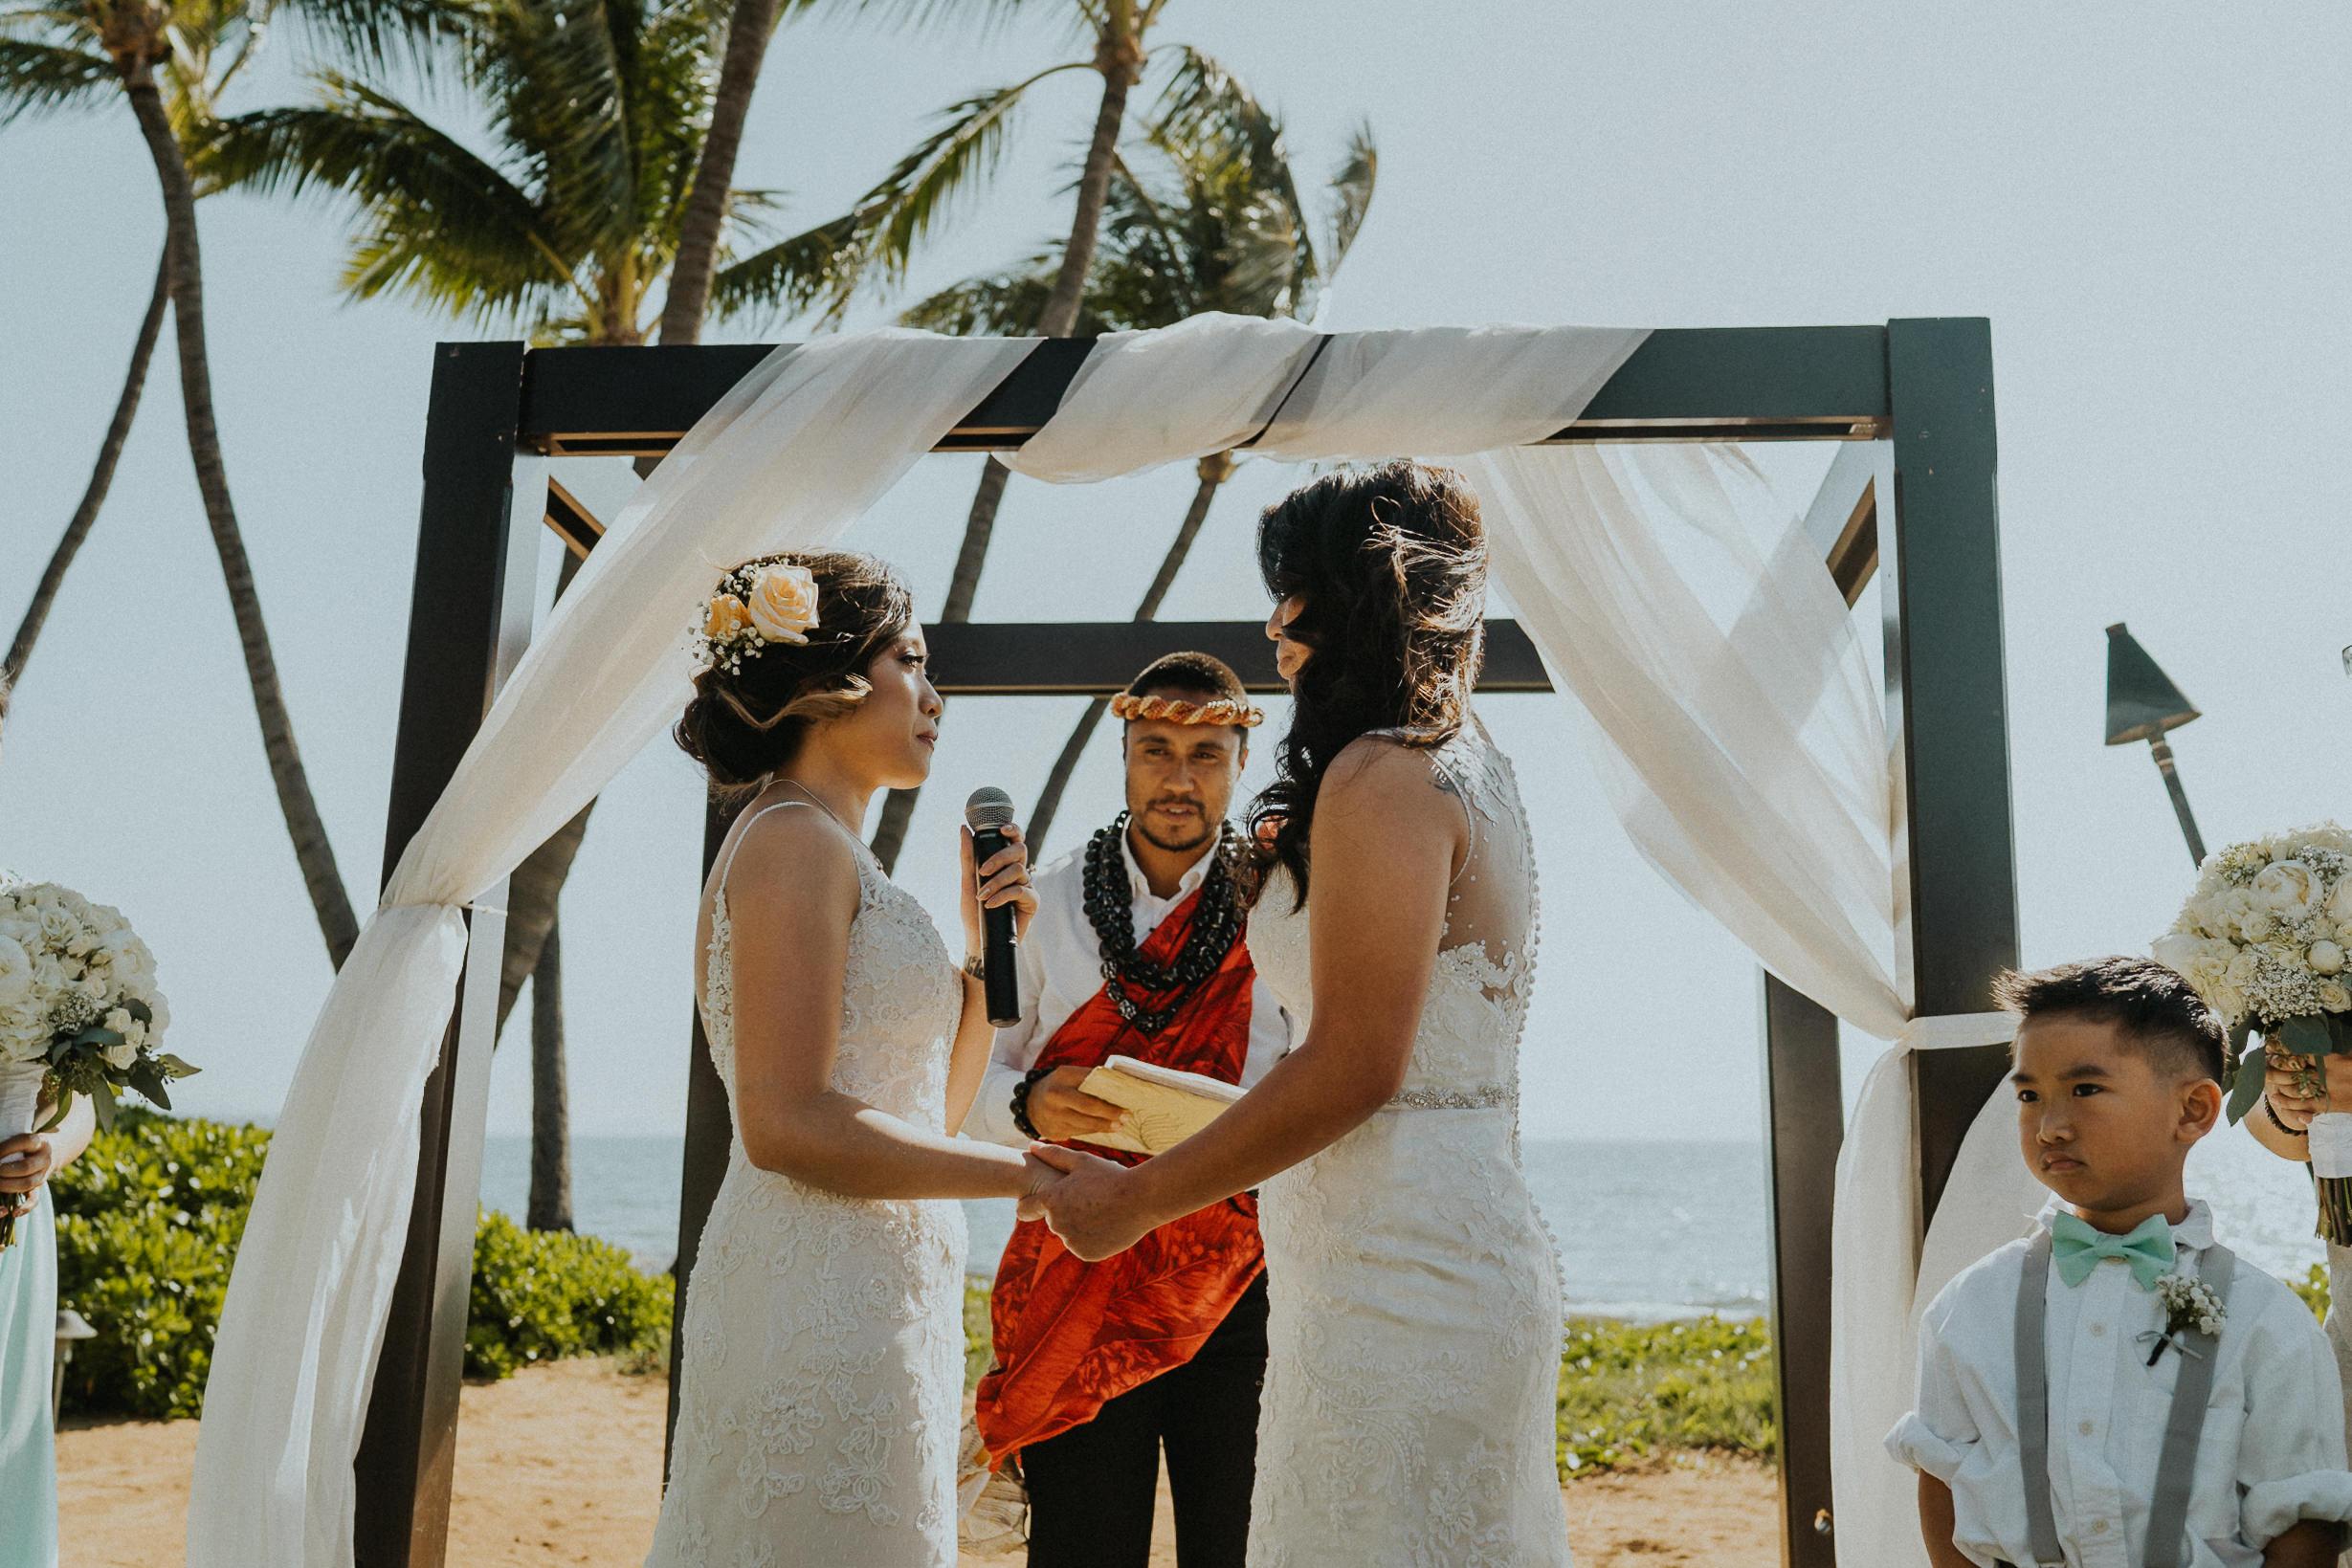 Maui_Destination_wedding_Alfred_Tang-11.jpg